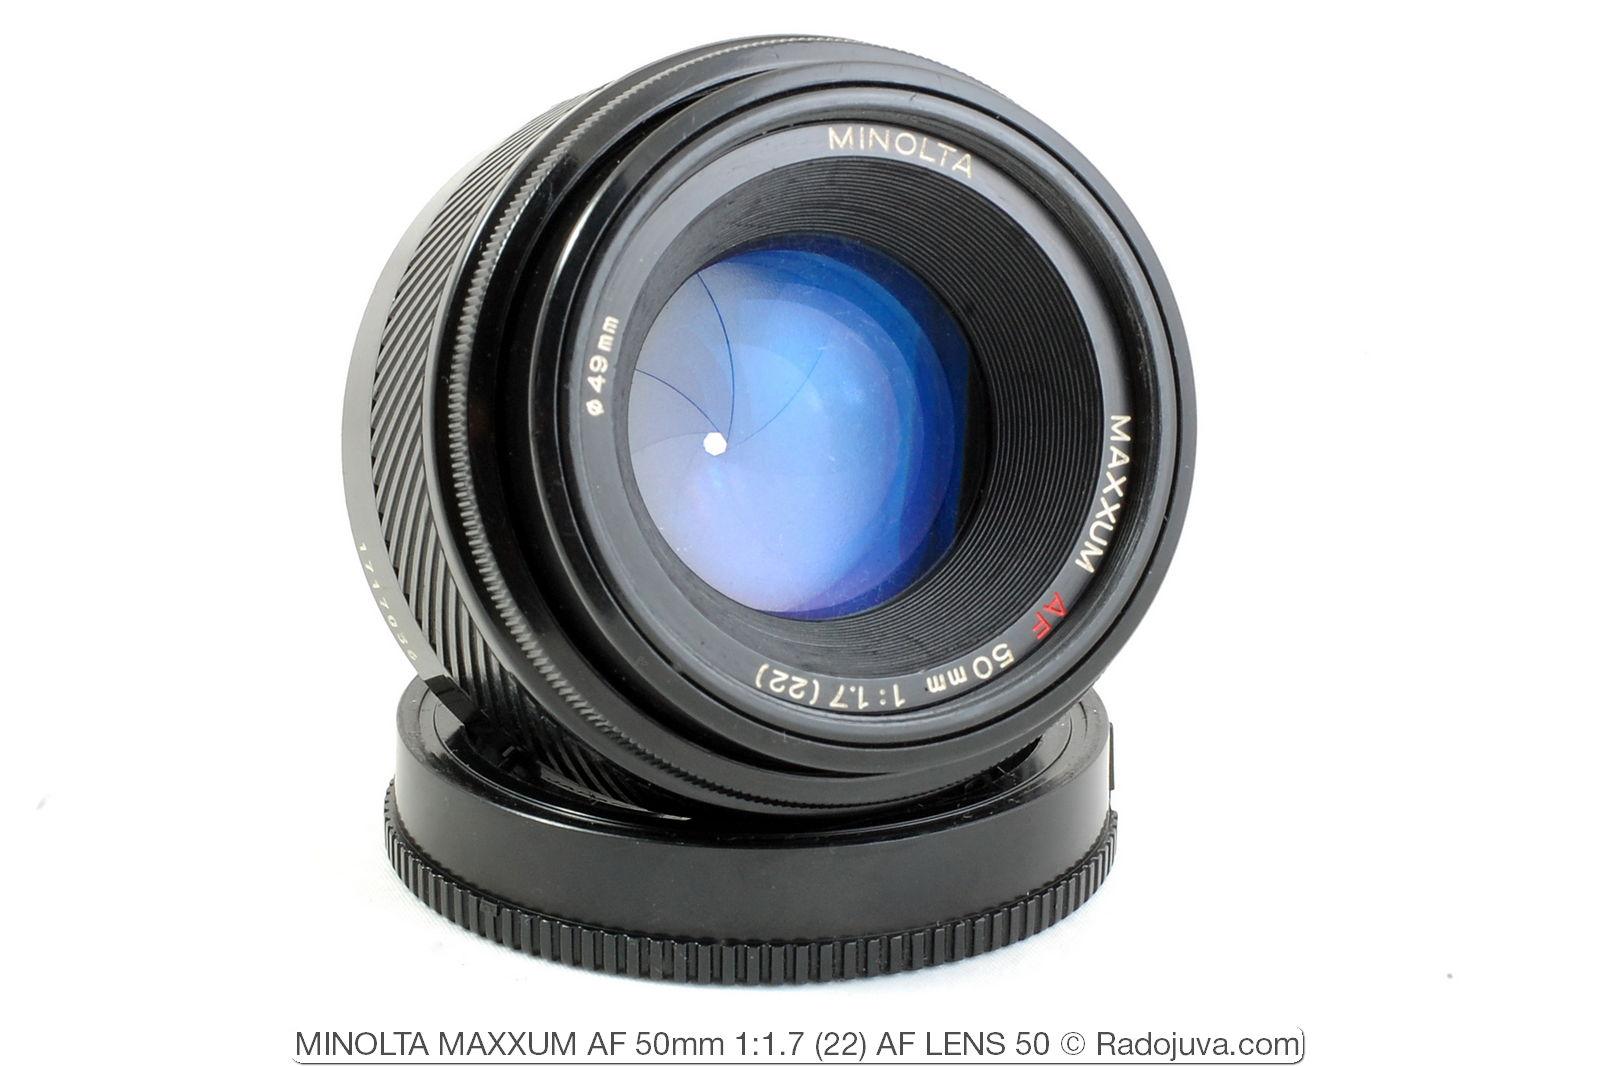 MINOLTA MAXXUM AF 50mm 1: 1.7 (22) AF LENS 50